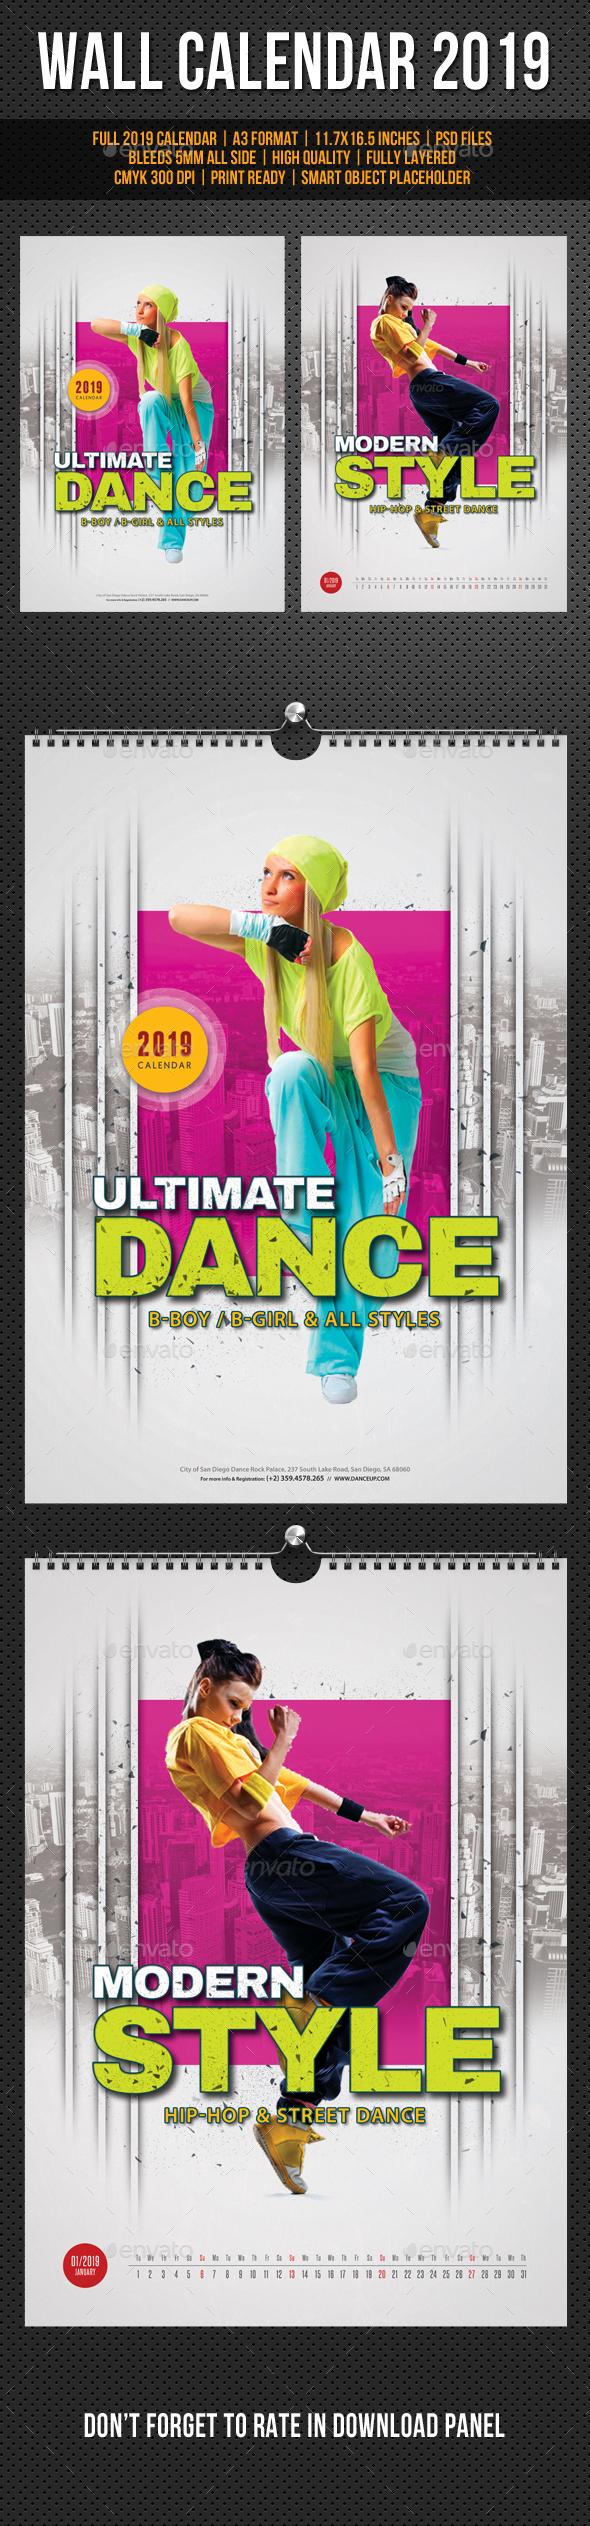 Modern Style Dance Wall Calendar A3 2019 - Calendars Stationery